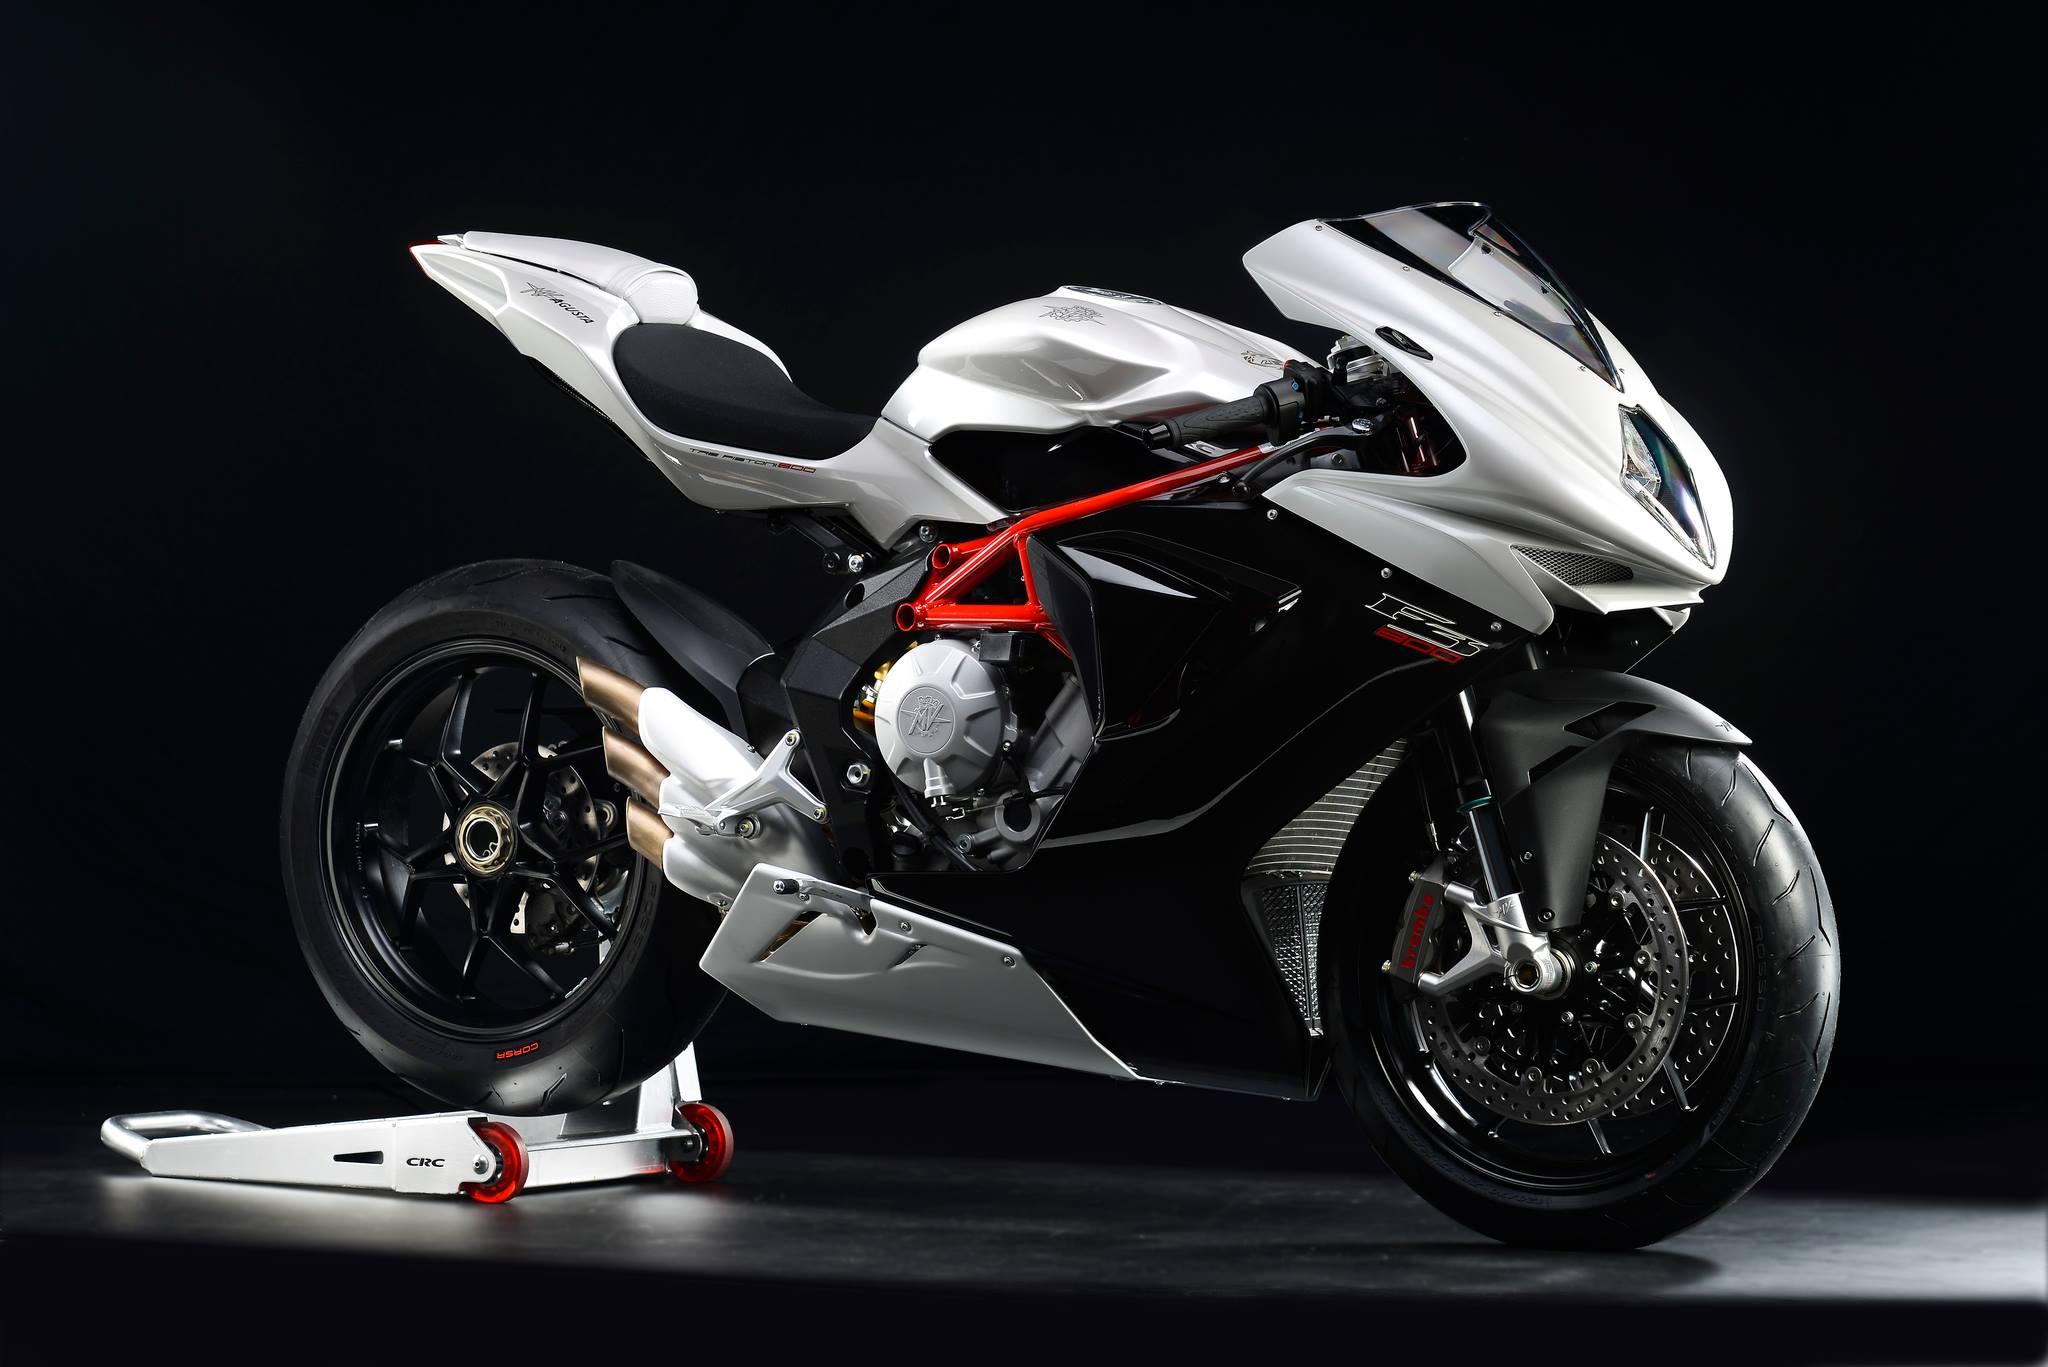 2014 Mv Agusta F3 800 Superbike Bike Motorbike F 3 F Wallpaper